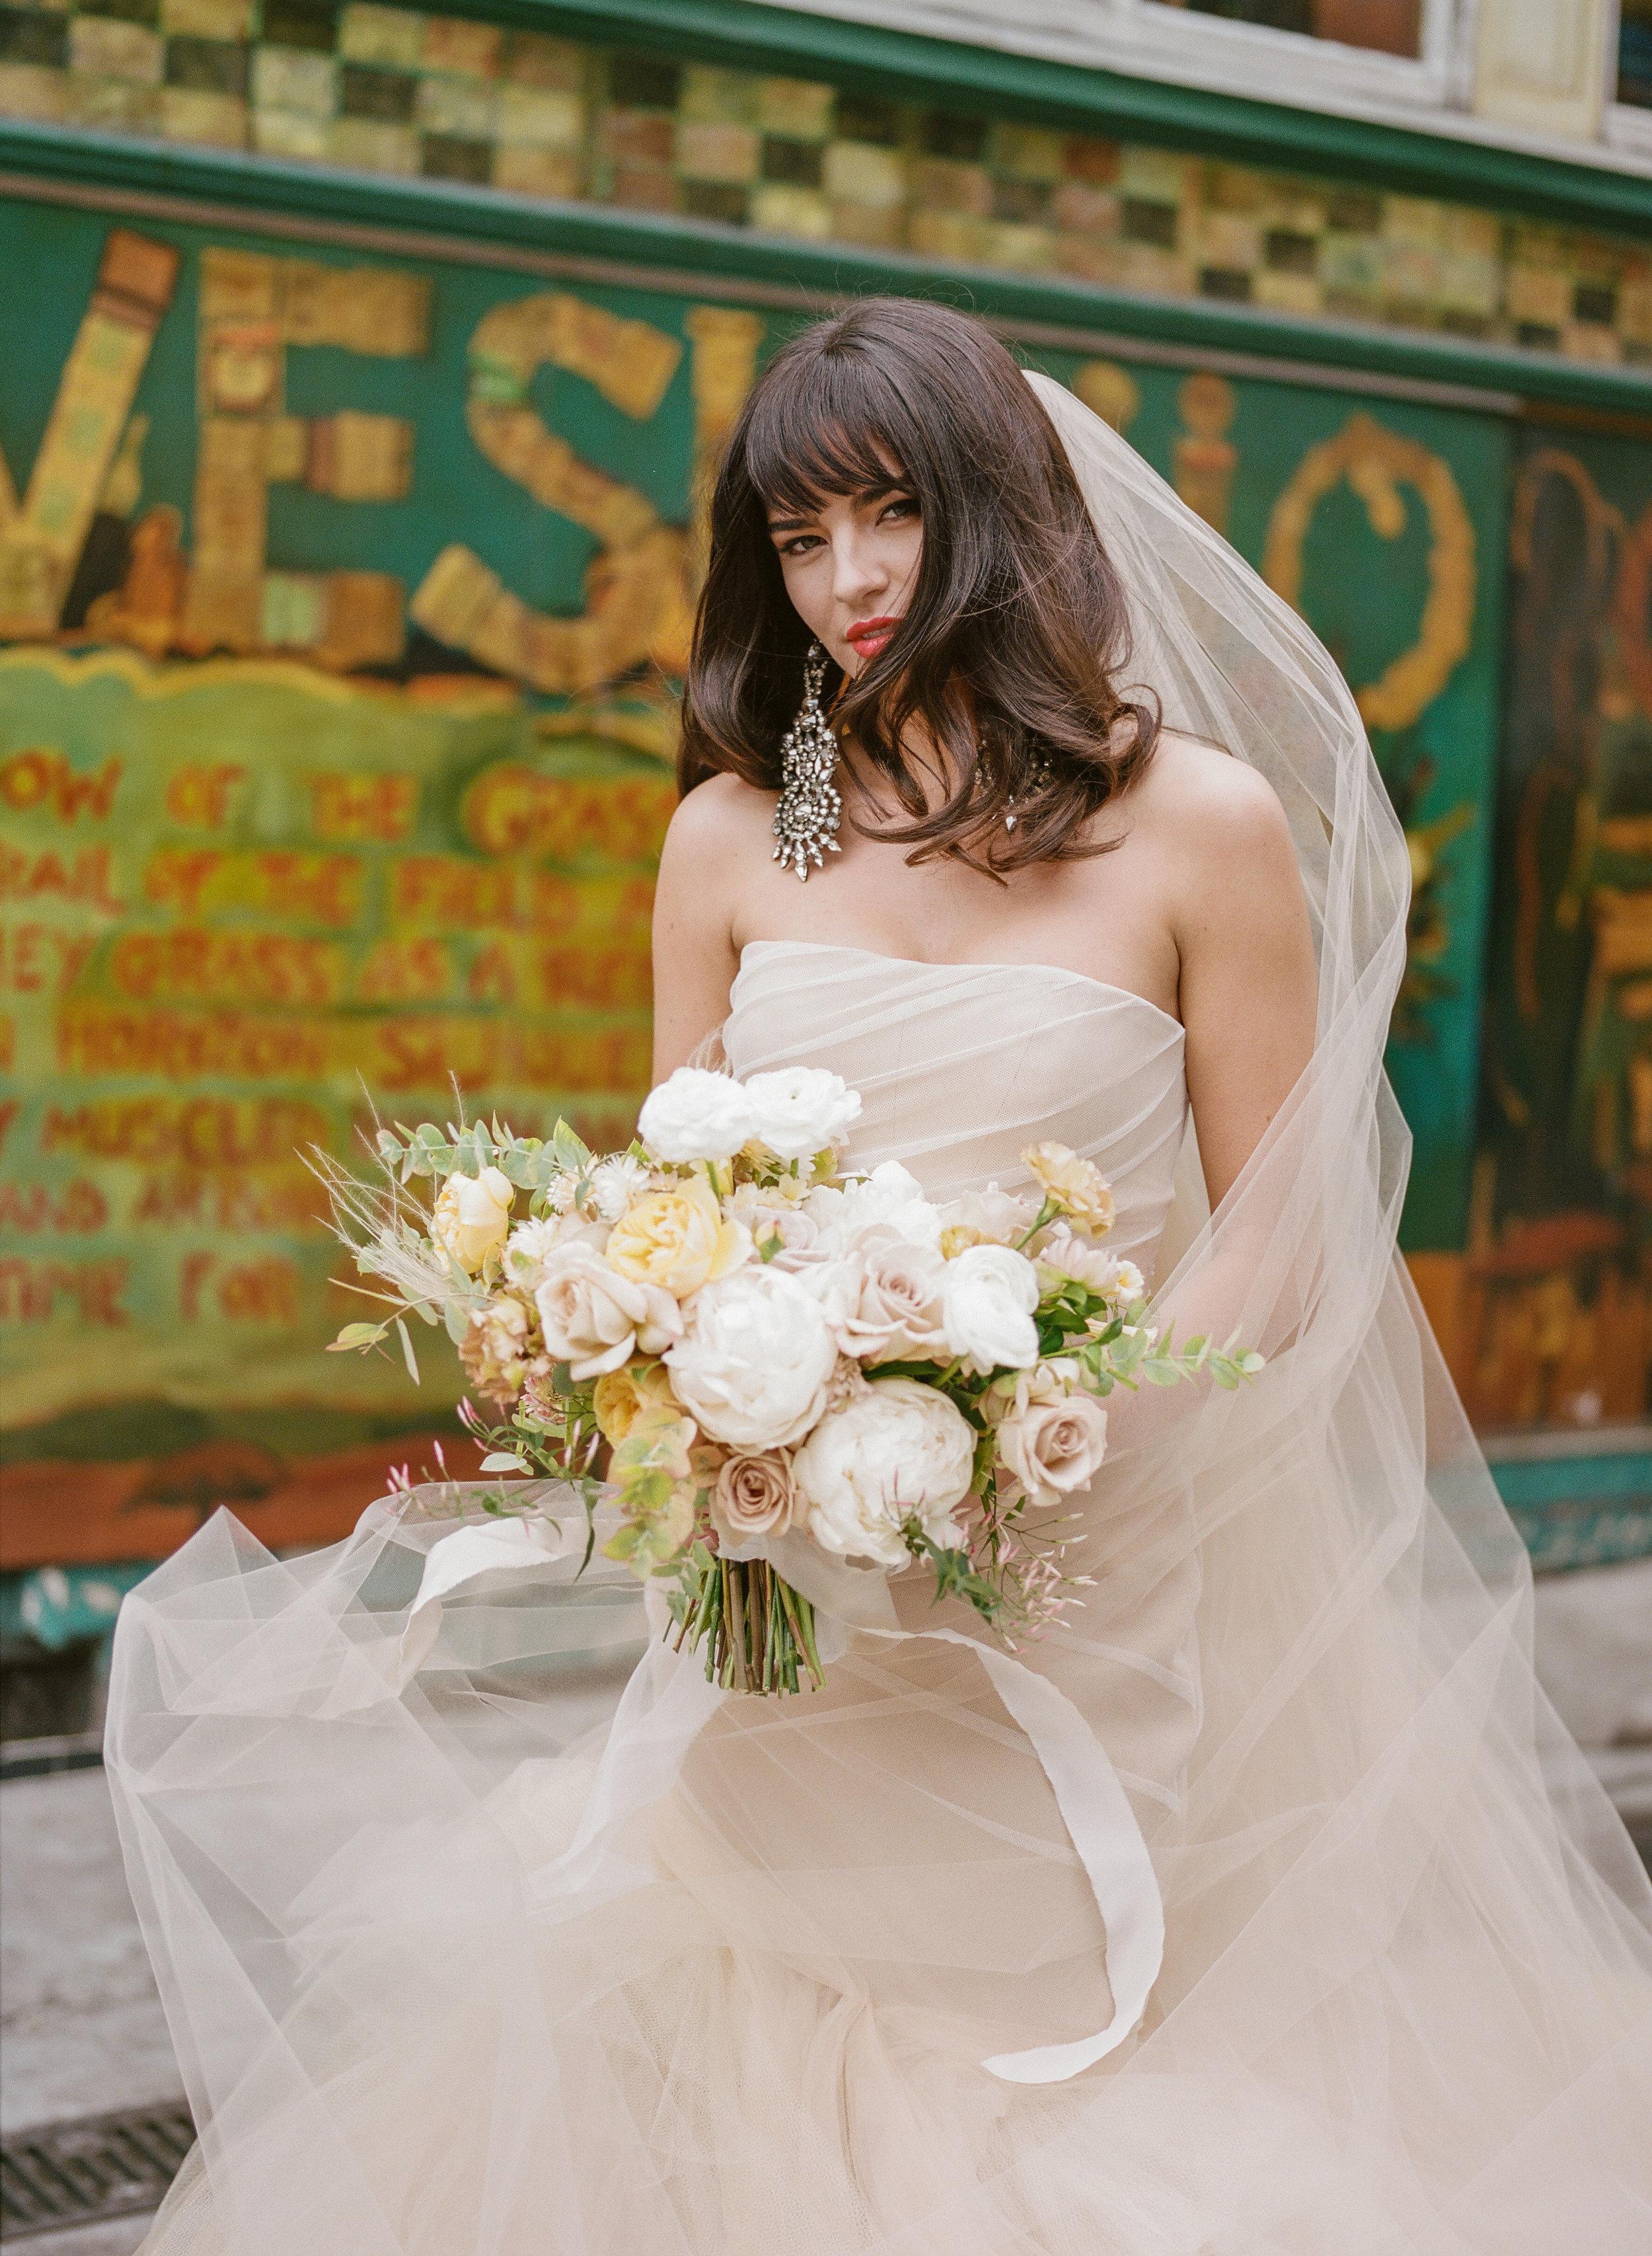 048-TodaysBride-ChristinaMcNeill-FILM-034.jpg